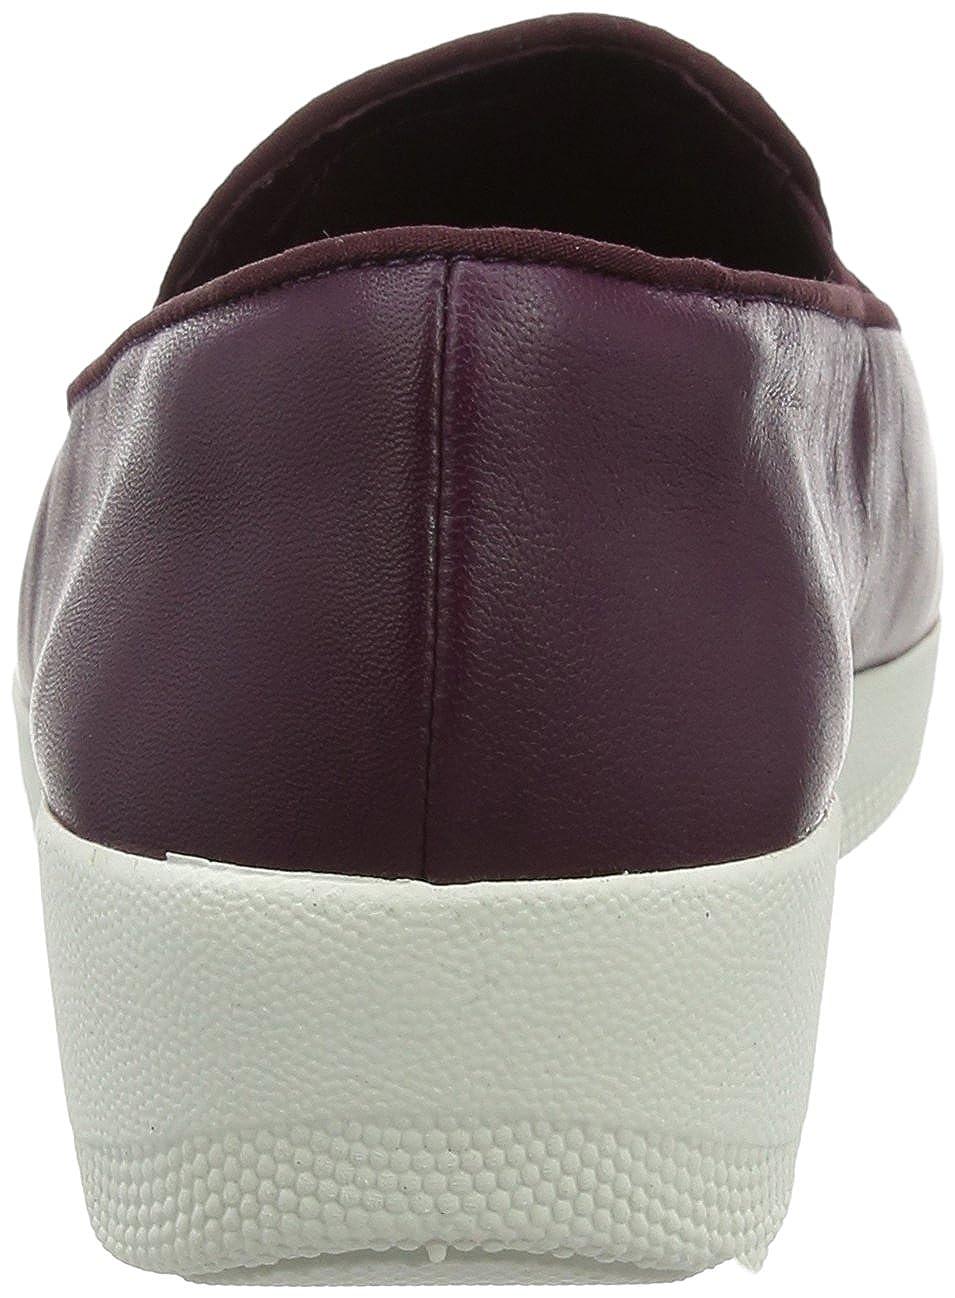 FitFlop Damen Tassel Violett Superskate Slipper, Deep Plum Violett Tassel (Deep Plum 398) 86de0c